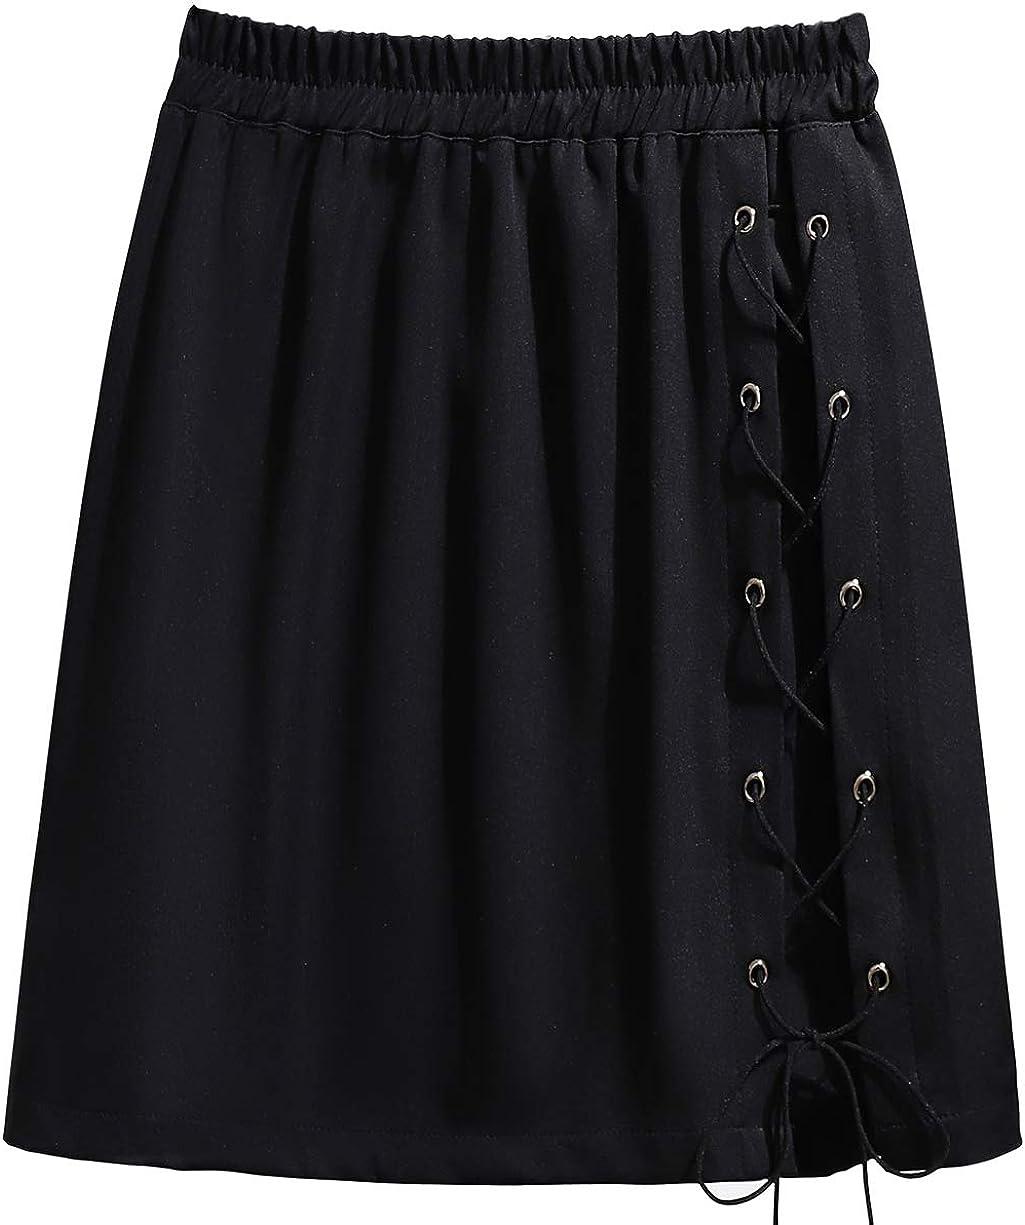 chouyatou Women's Casual Stretched High Waist Slim Criss-Cross Drawstring A-Line Short Skirt